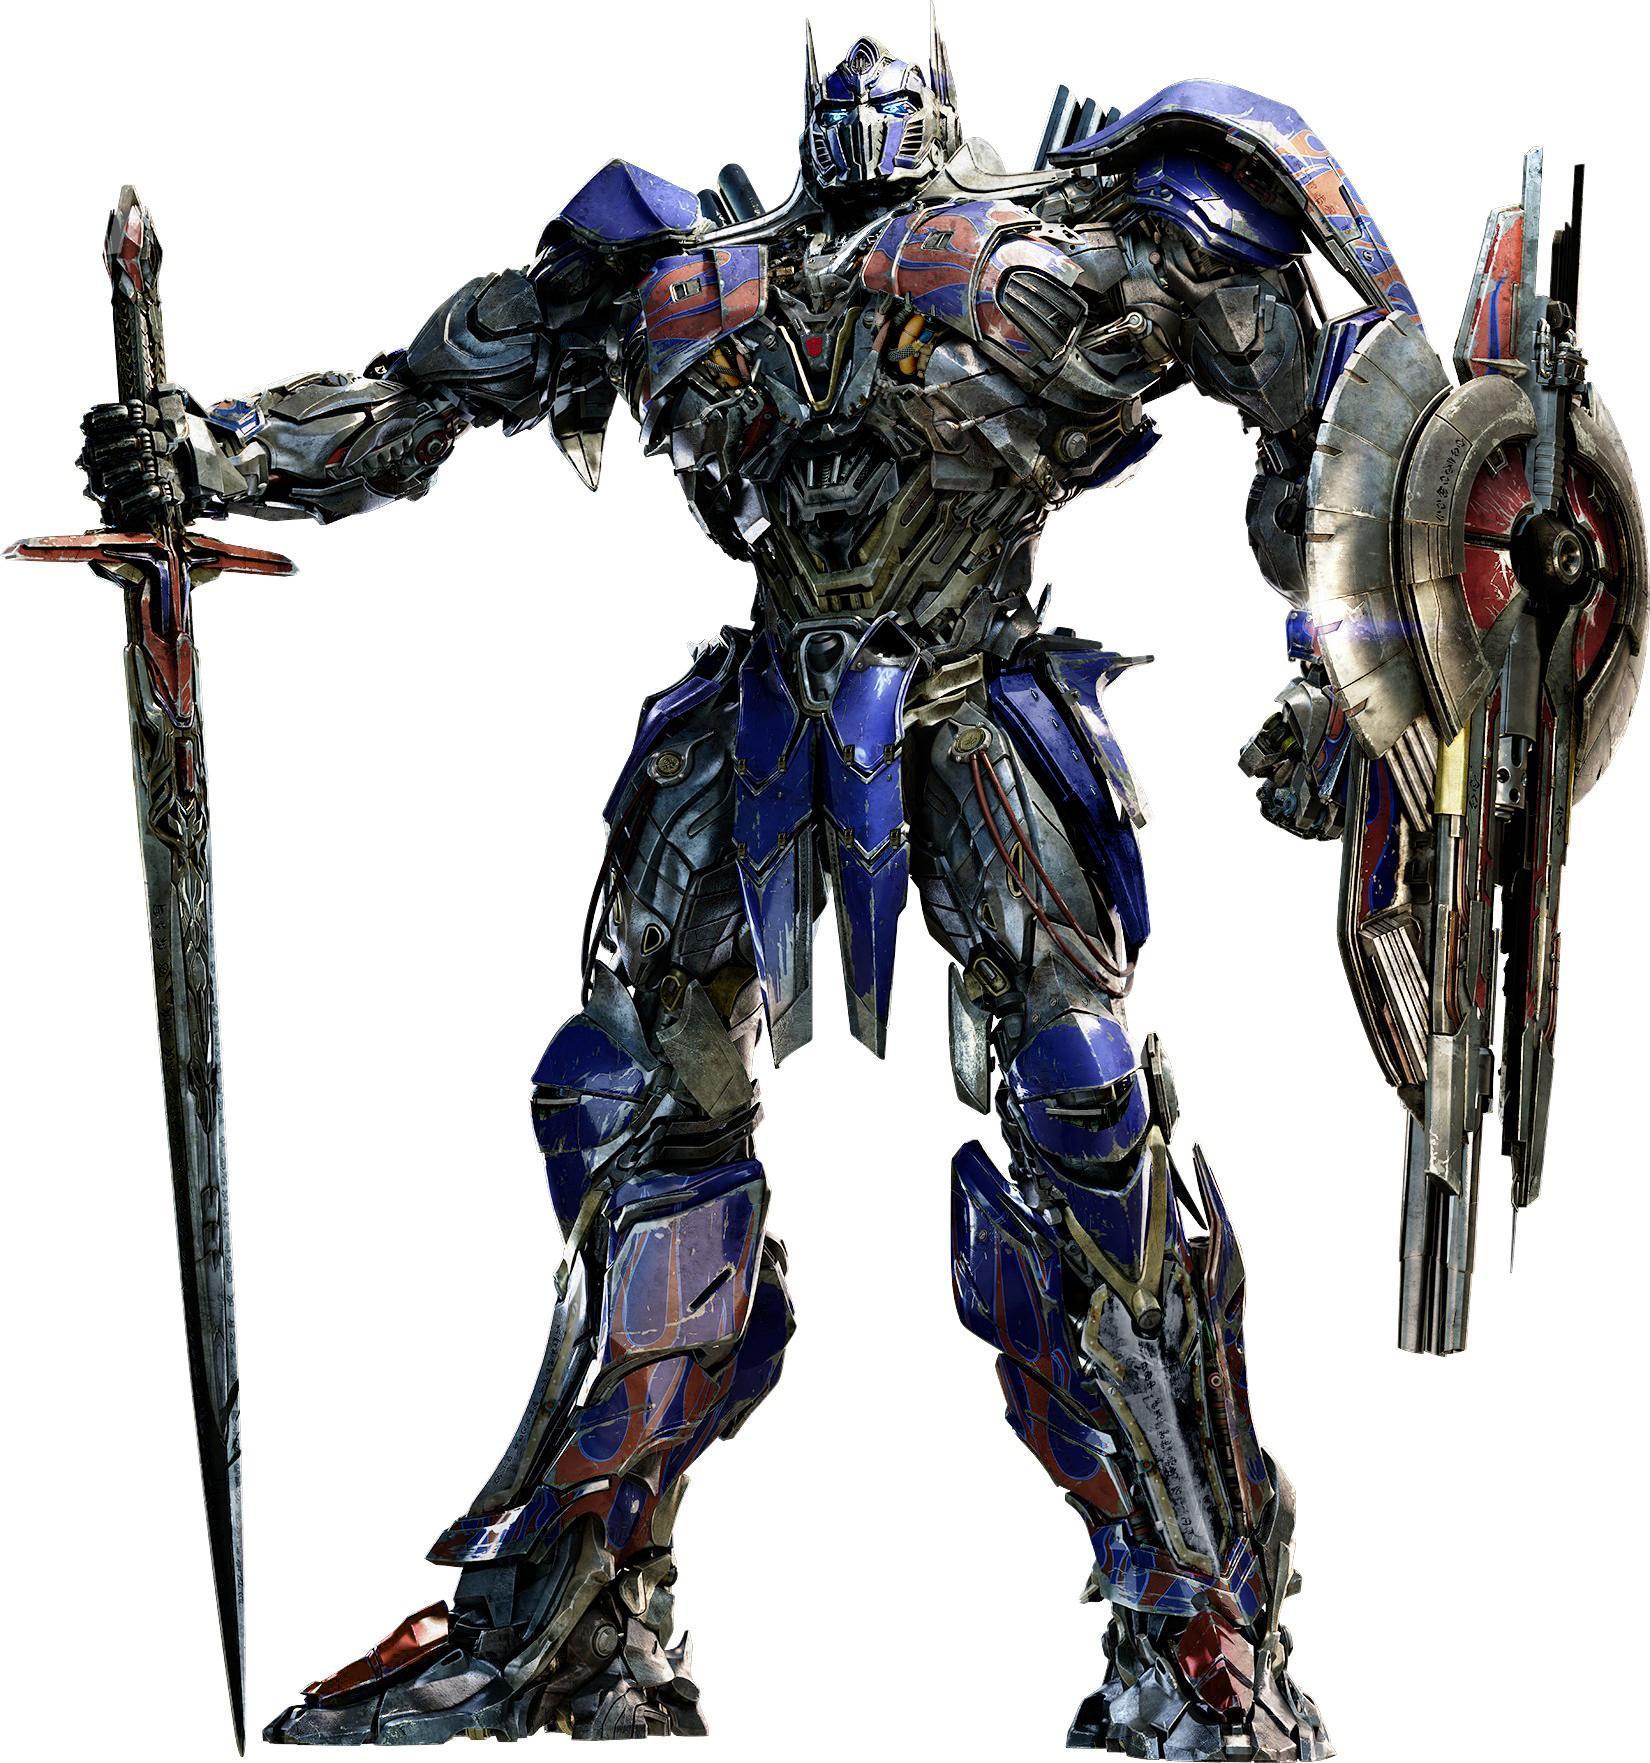 Transformer Optimus Prime HD Wallpapers Top Free